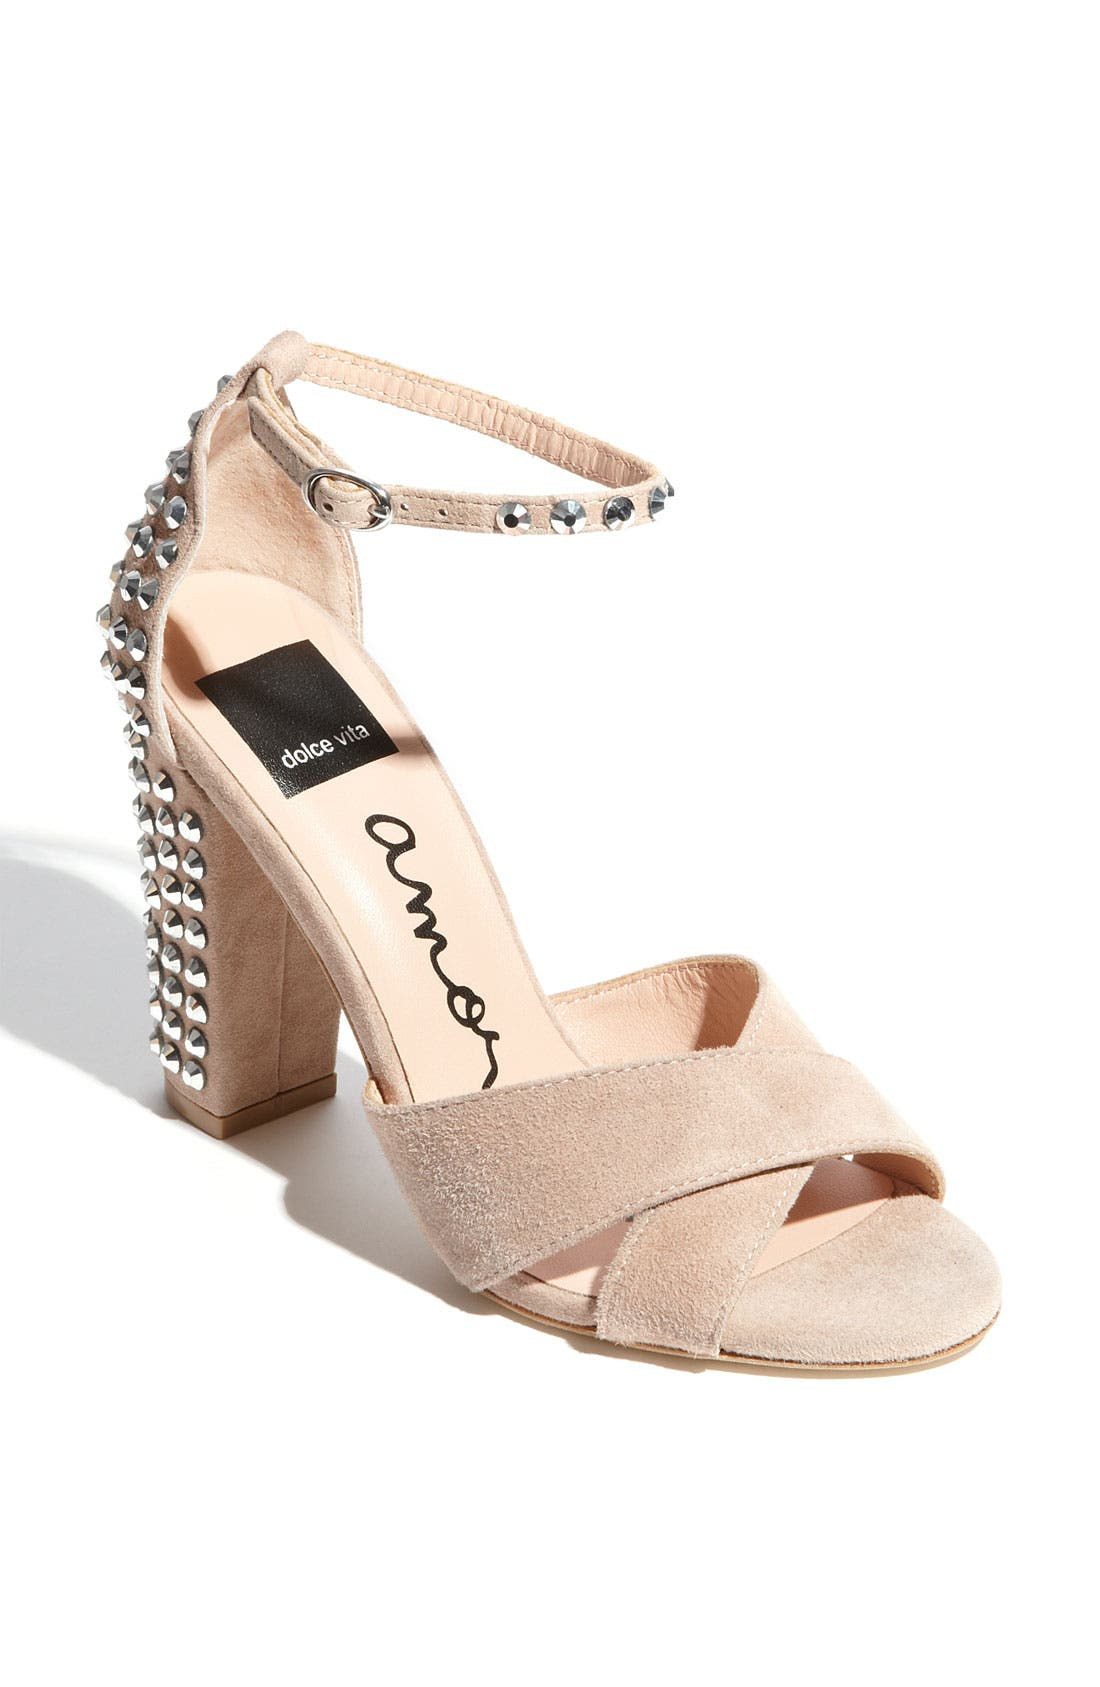 Main Image - Dolce Vita 'Kitz' Sandal